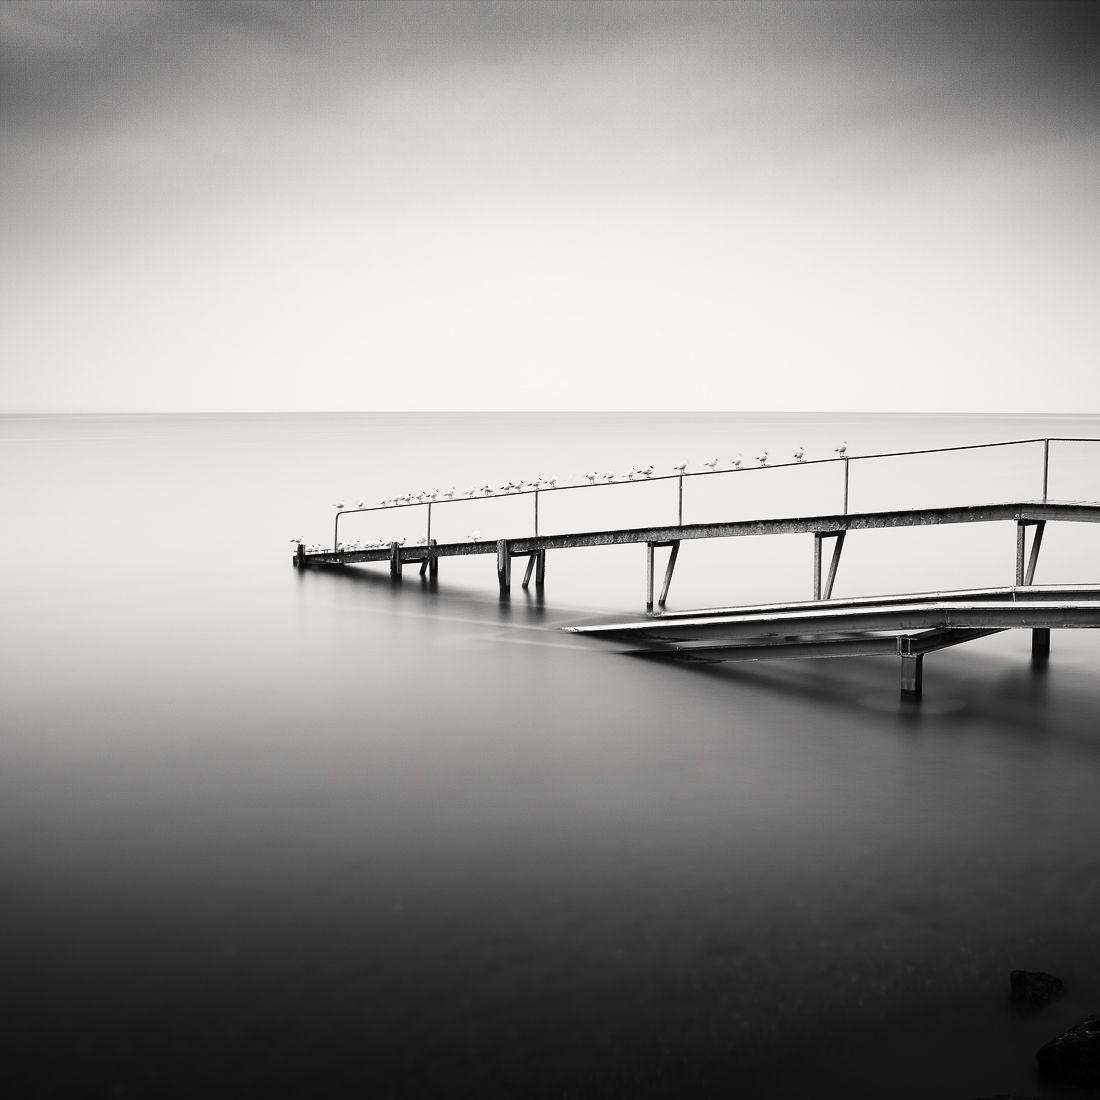 © Olivier Robert: Lakes, from Léman to Biwa / MonoVisions Awards 2017 winner